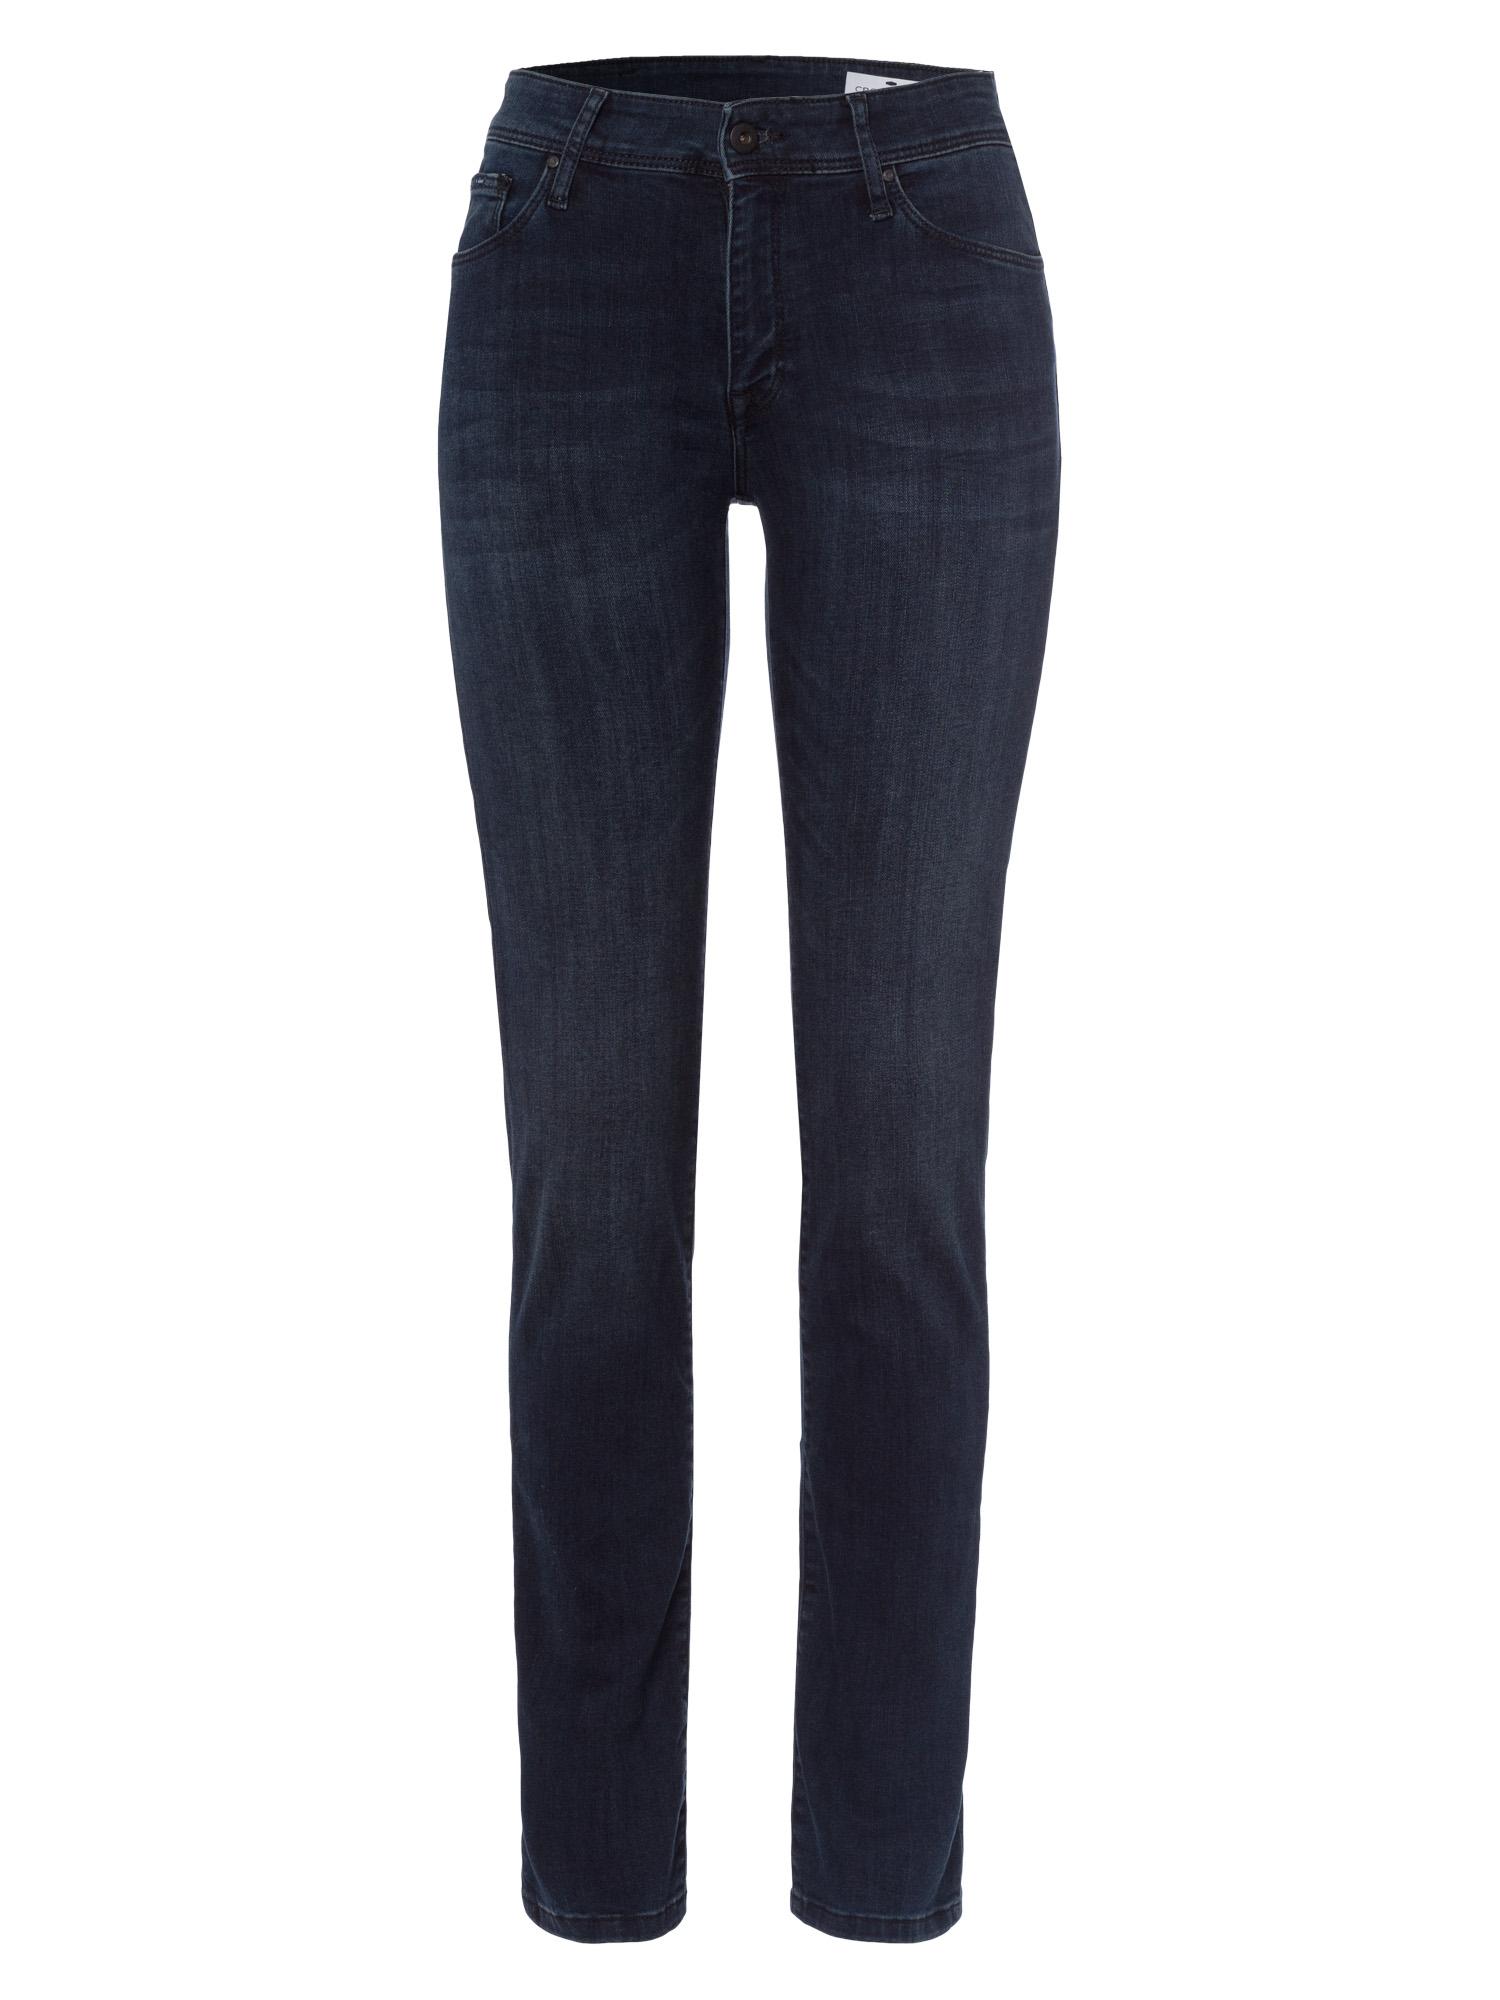 Cross Jeans Anya Slim Fit L36 Inch, light grey